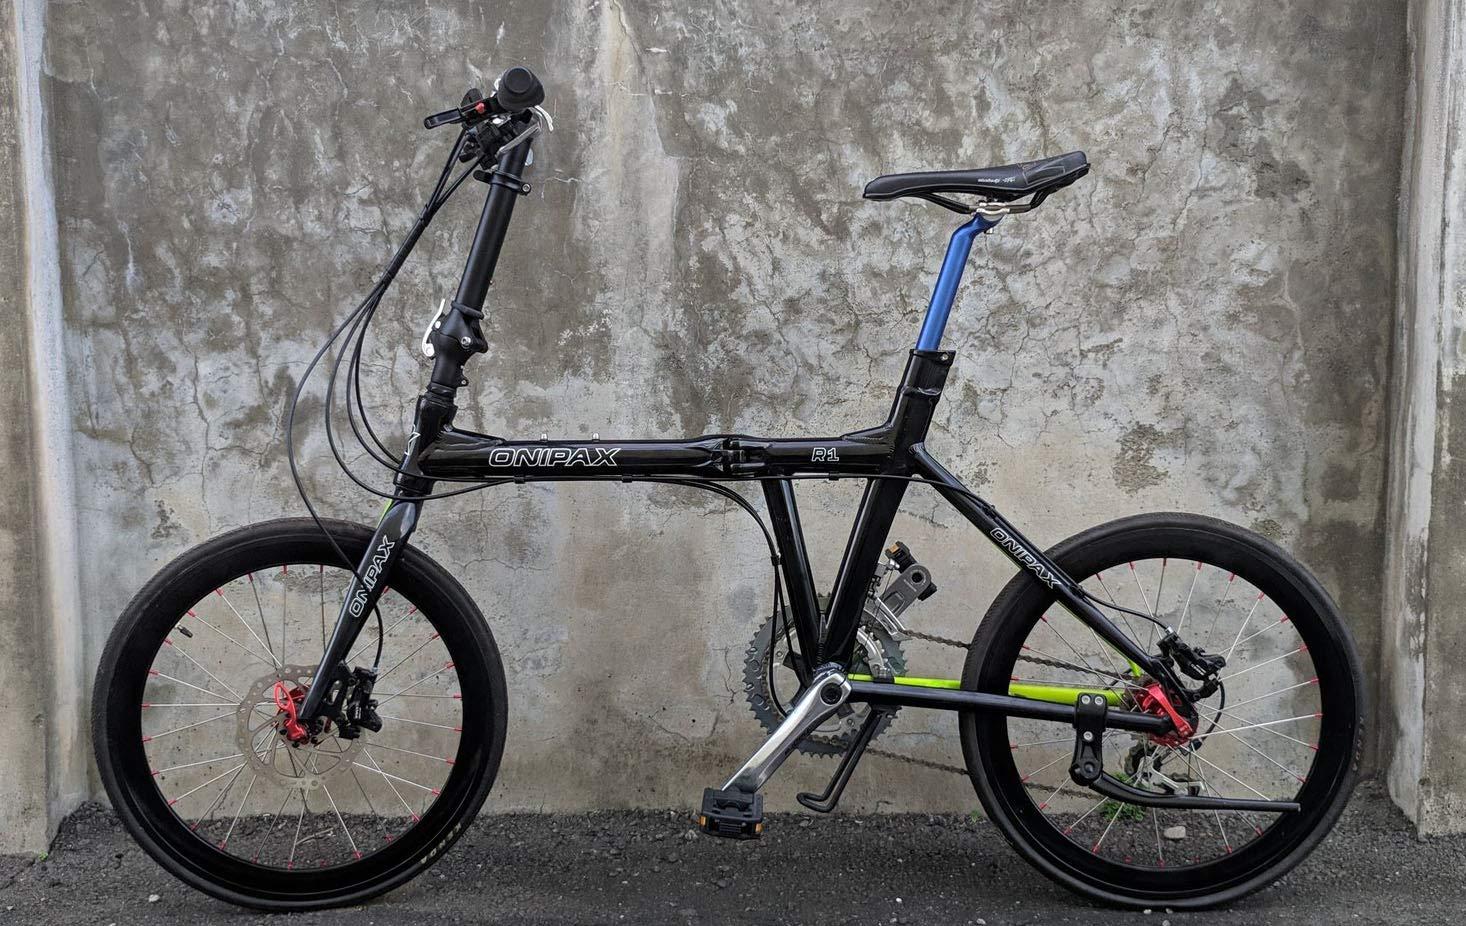 VOSAREA 5pcs Aluminium Alloy Grenade Shaped Car Bike Tyre Valve Dust Caps Cover Blue